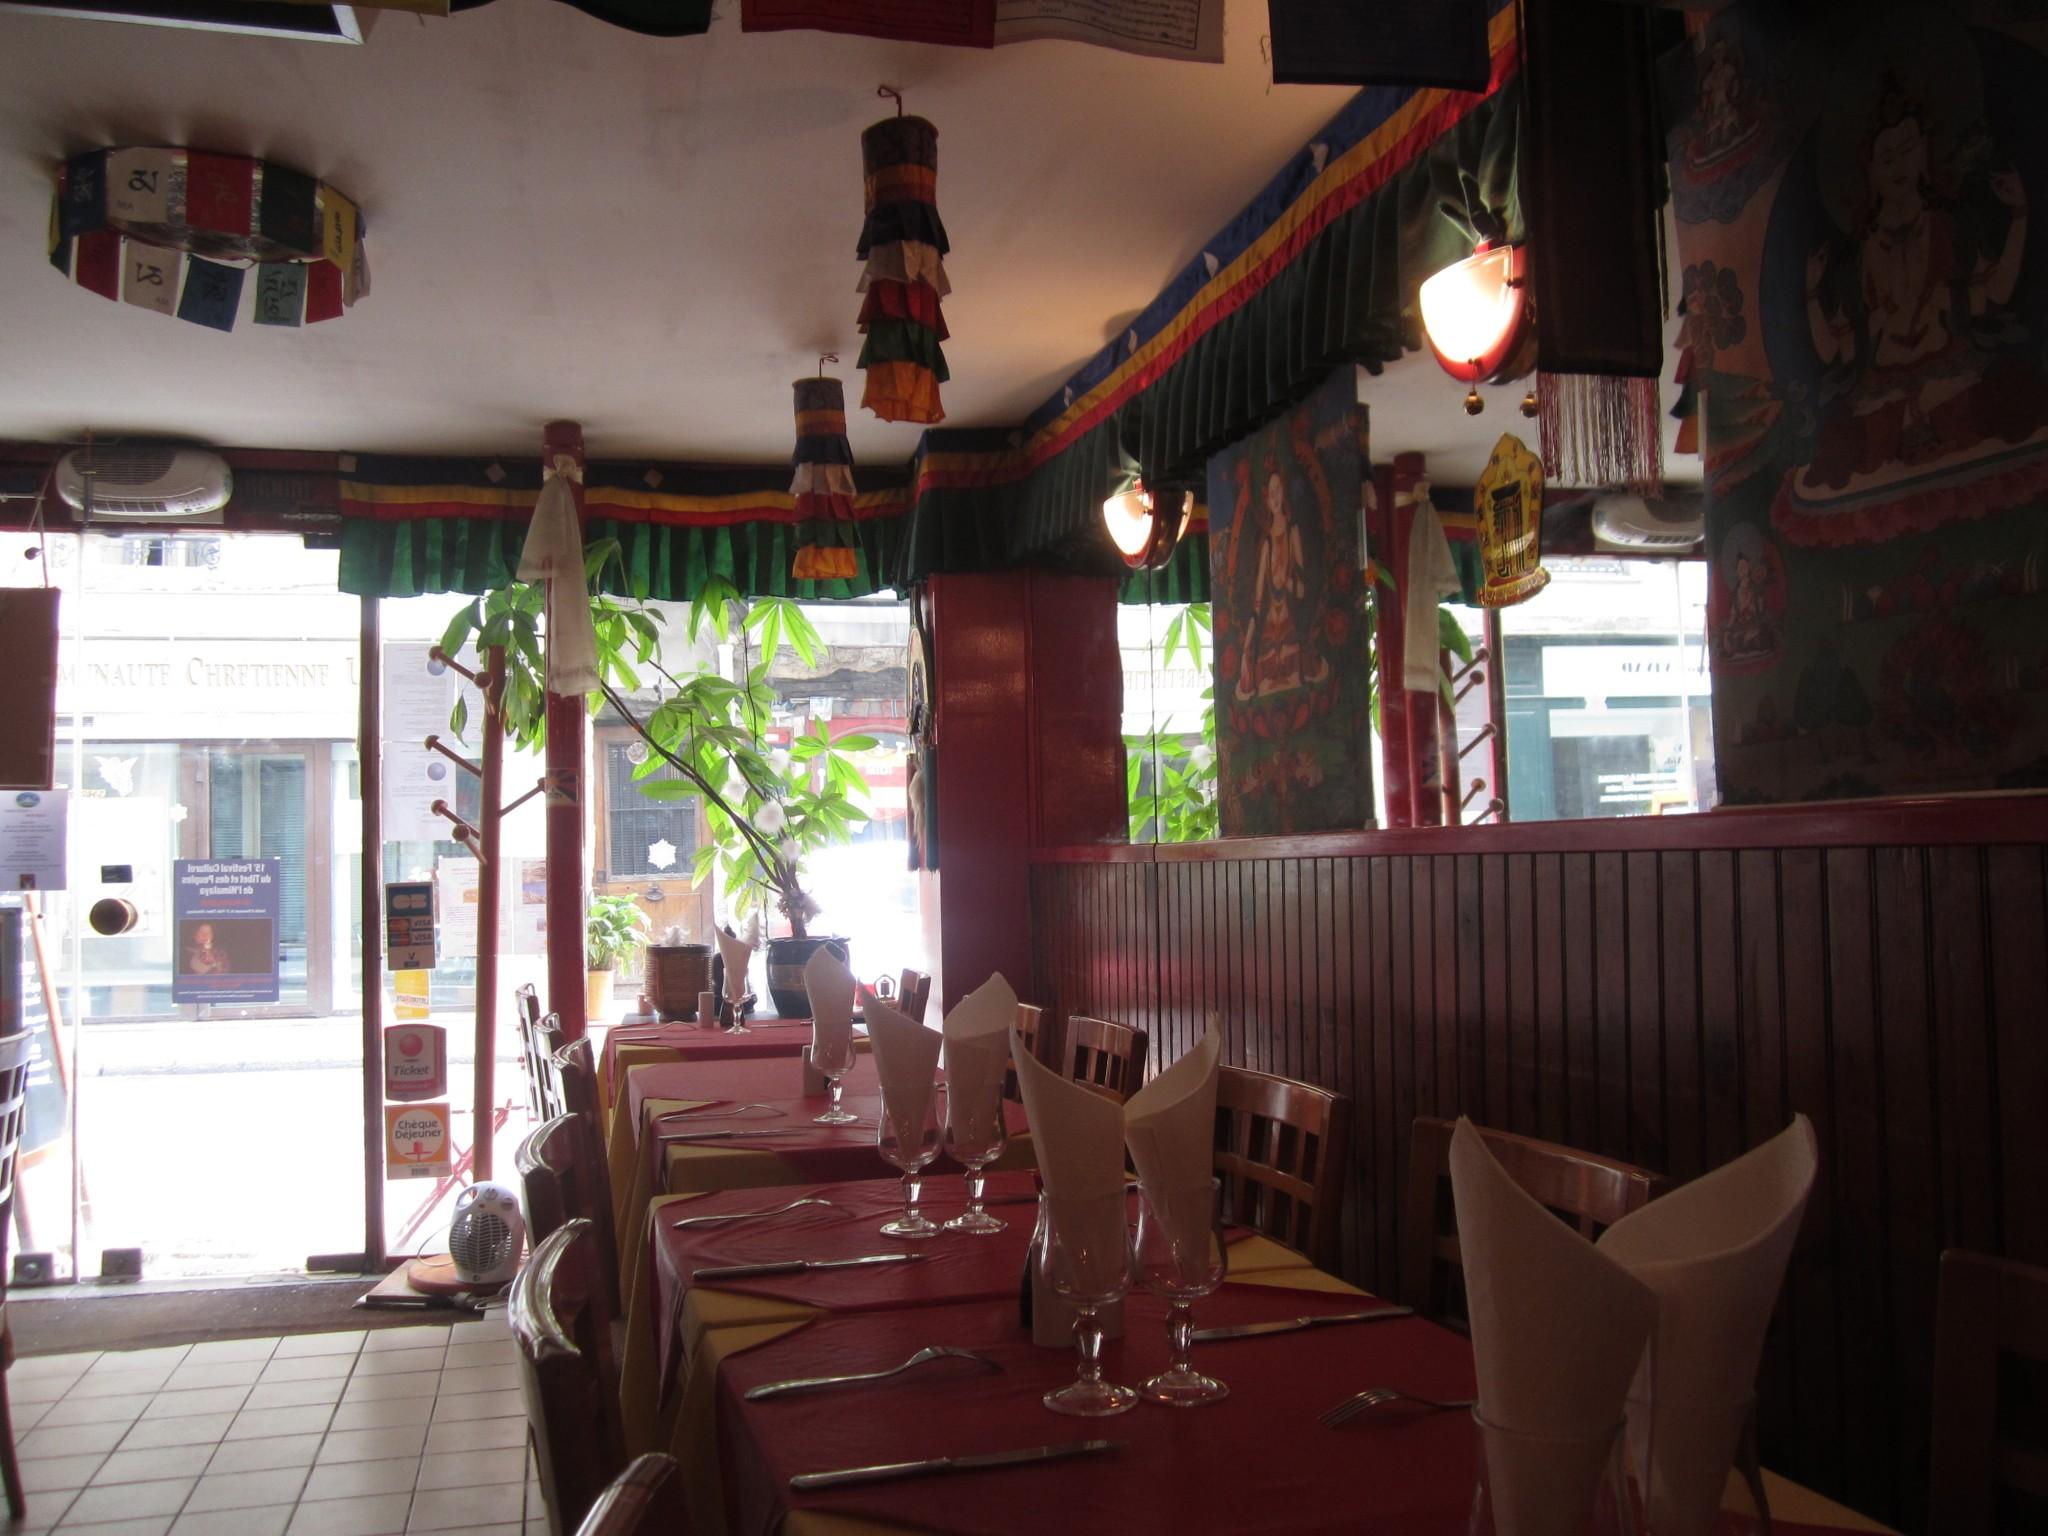 Pari pariisilaista restauranttia - Ranskatar reissaa c7bb0c86ff